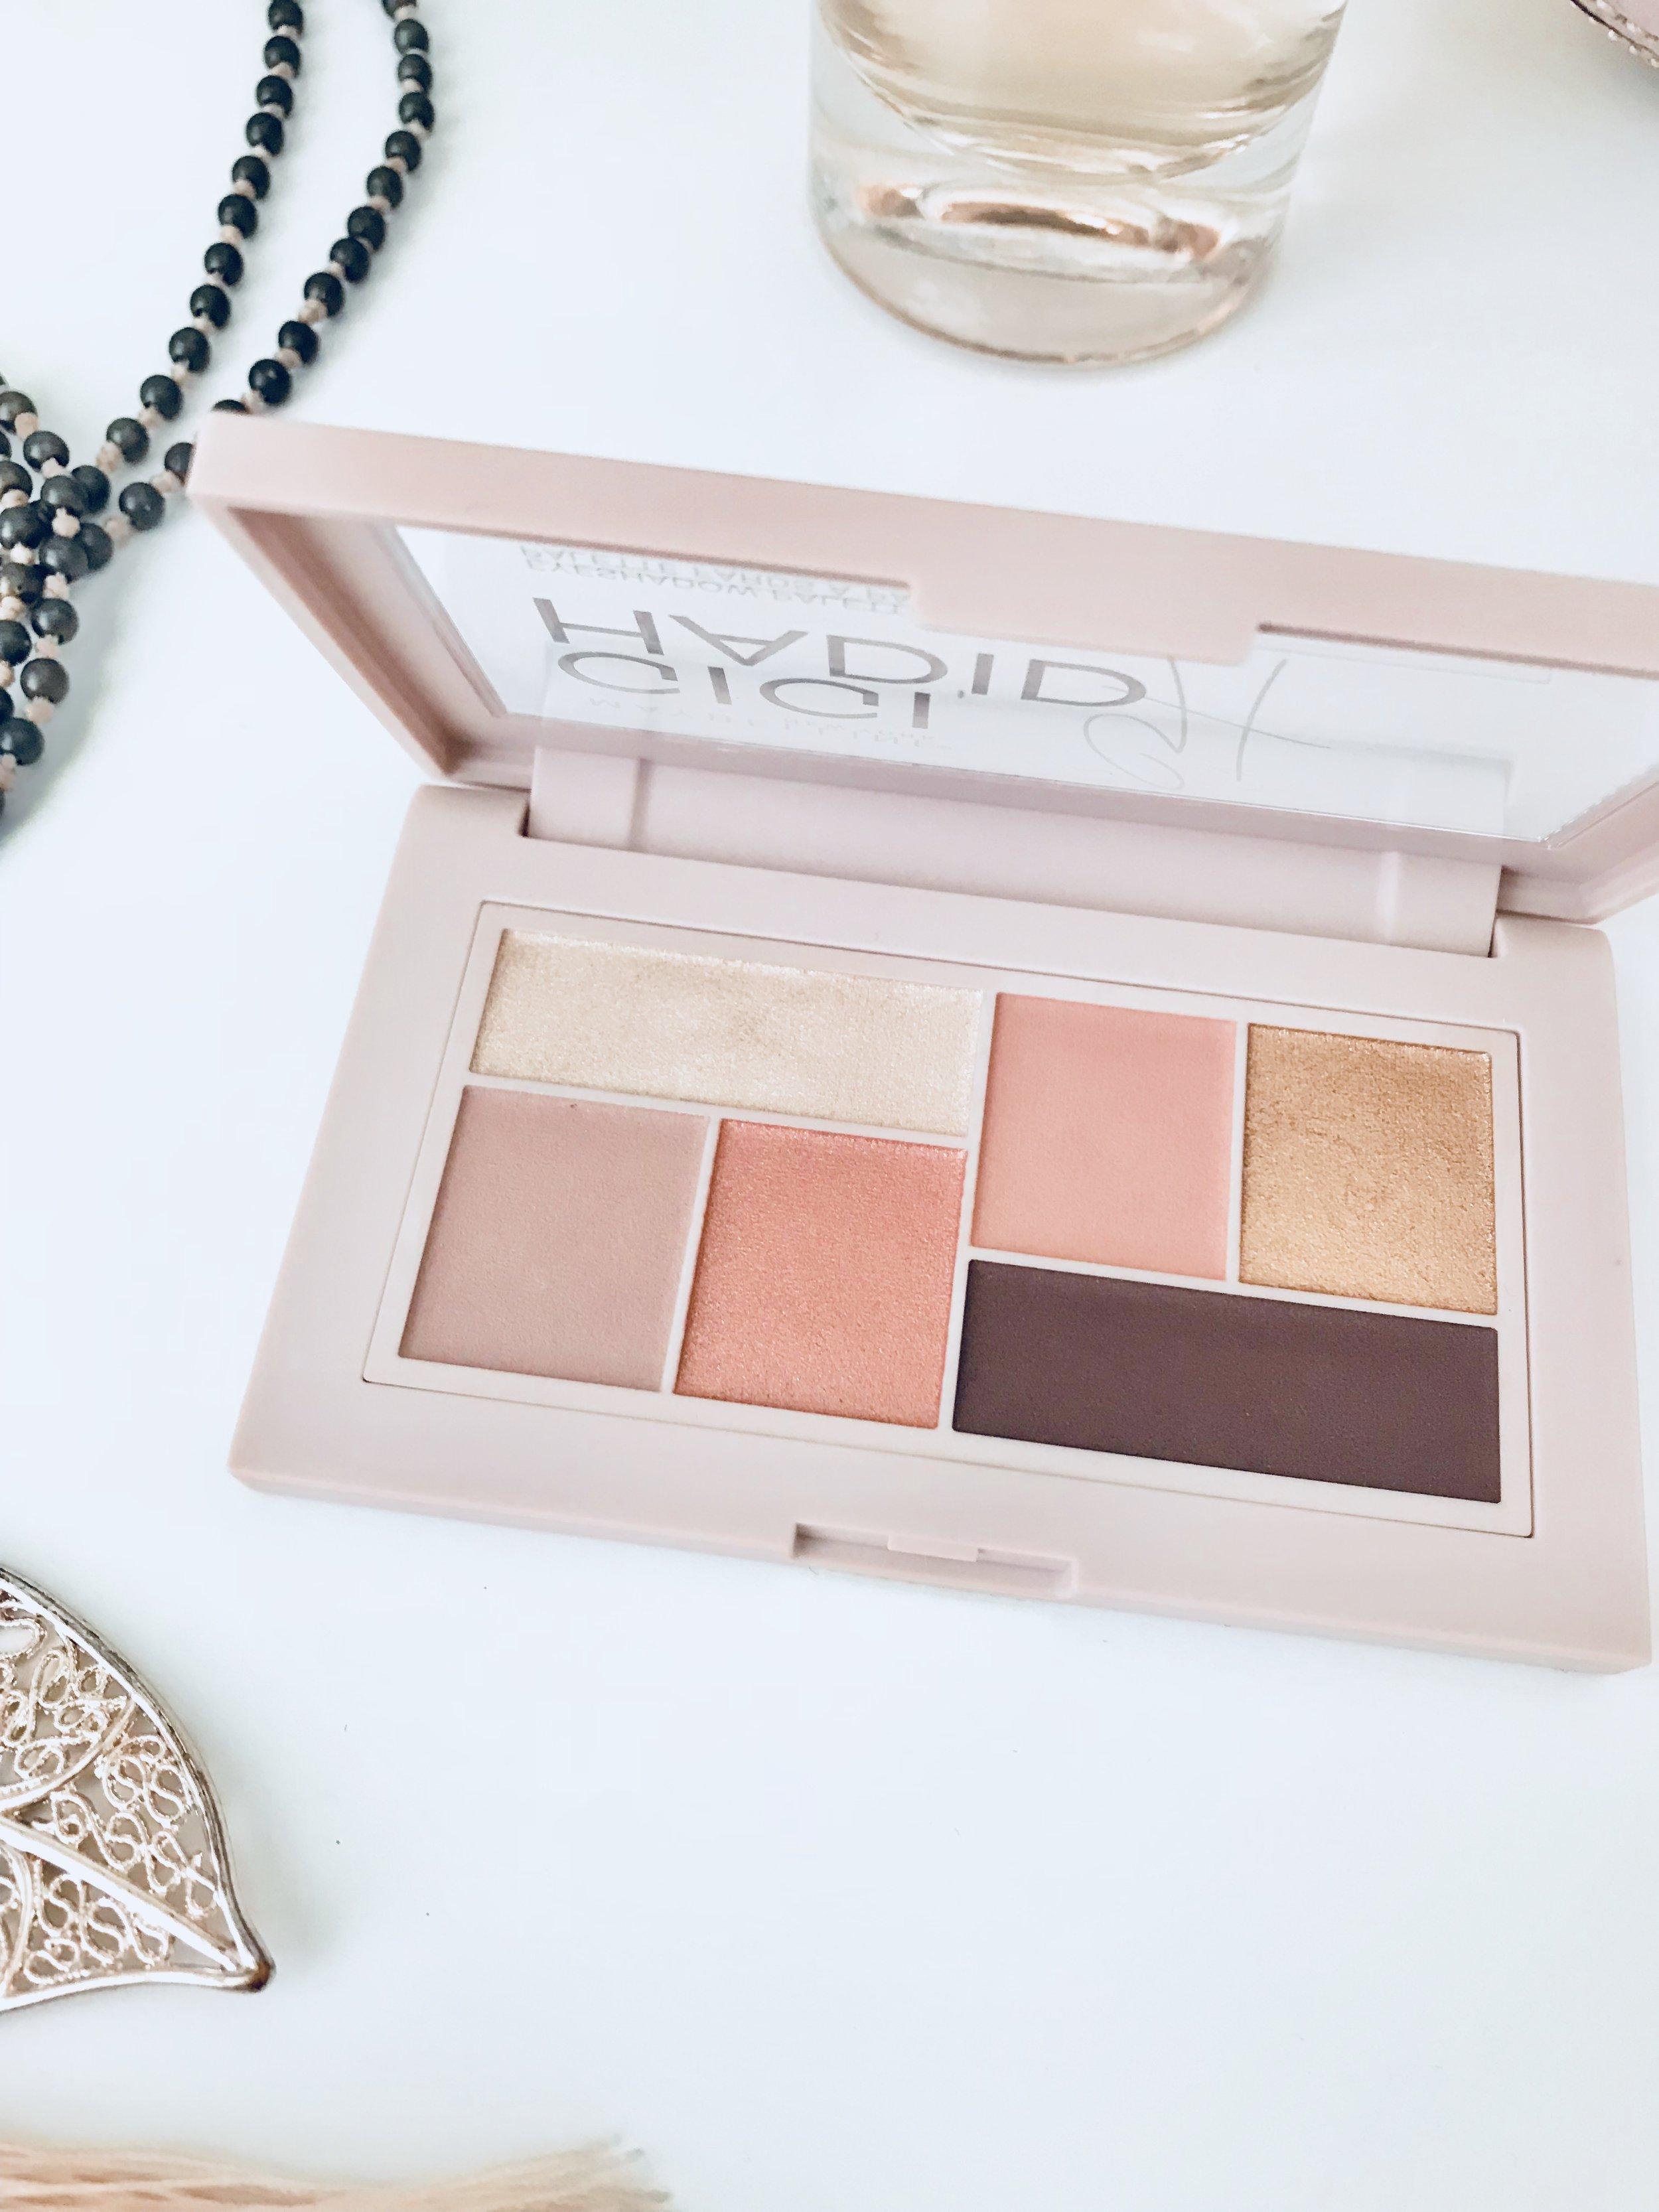 Gigi Hadid x Maybelline Eyeshadow Palette